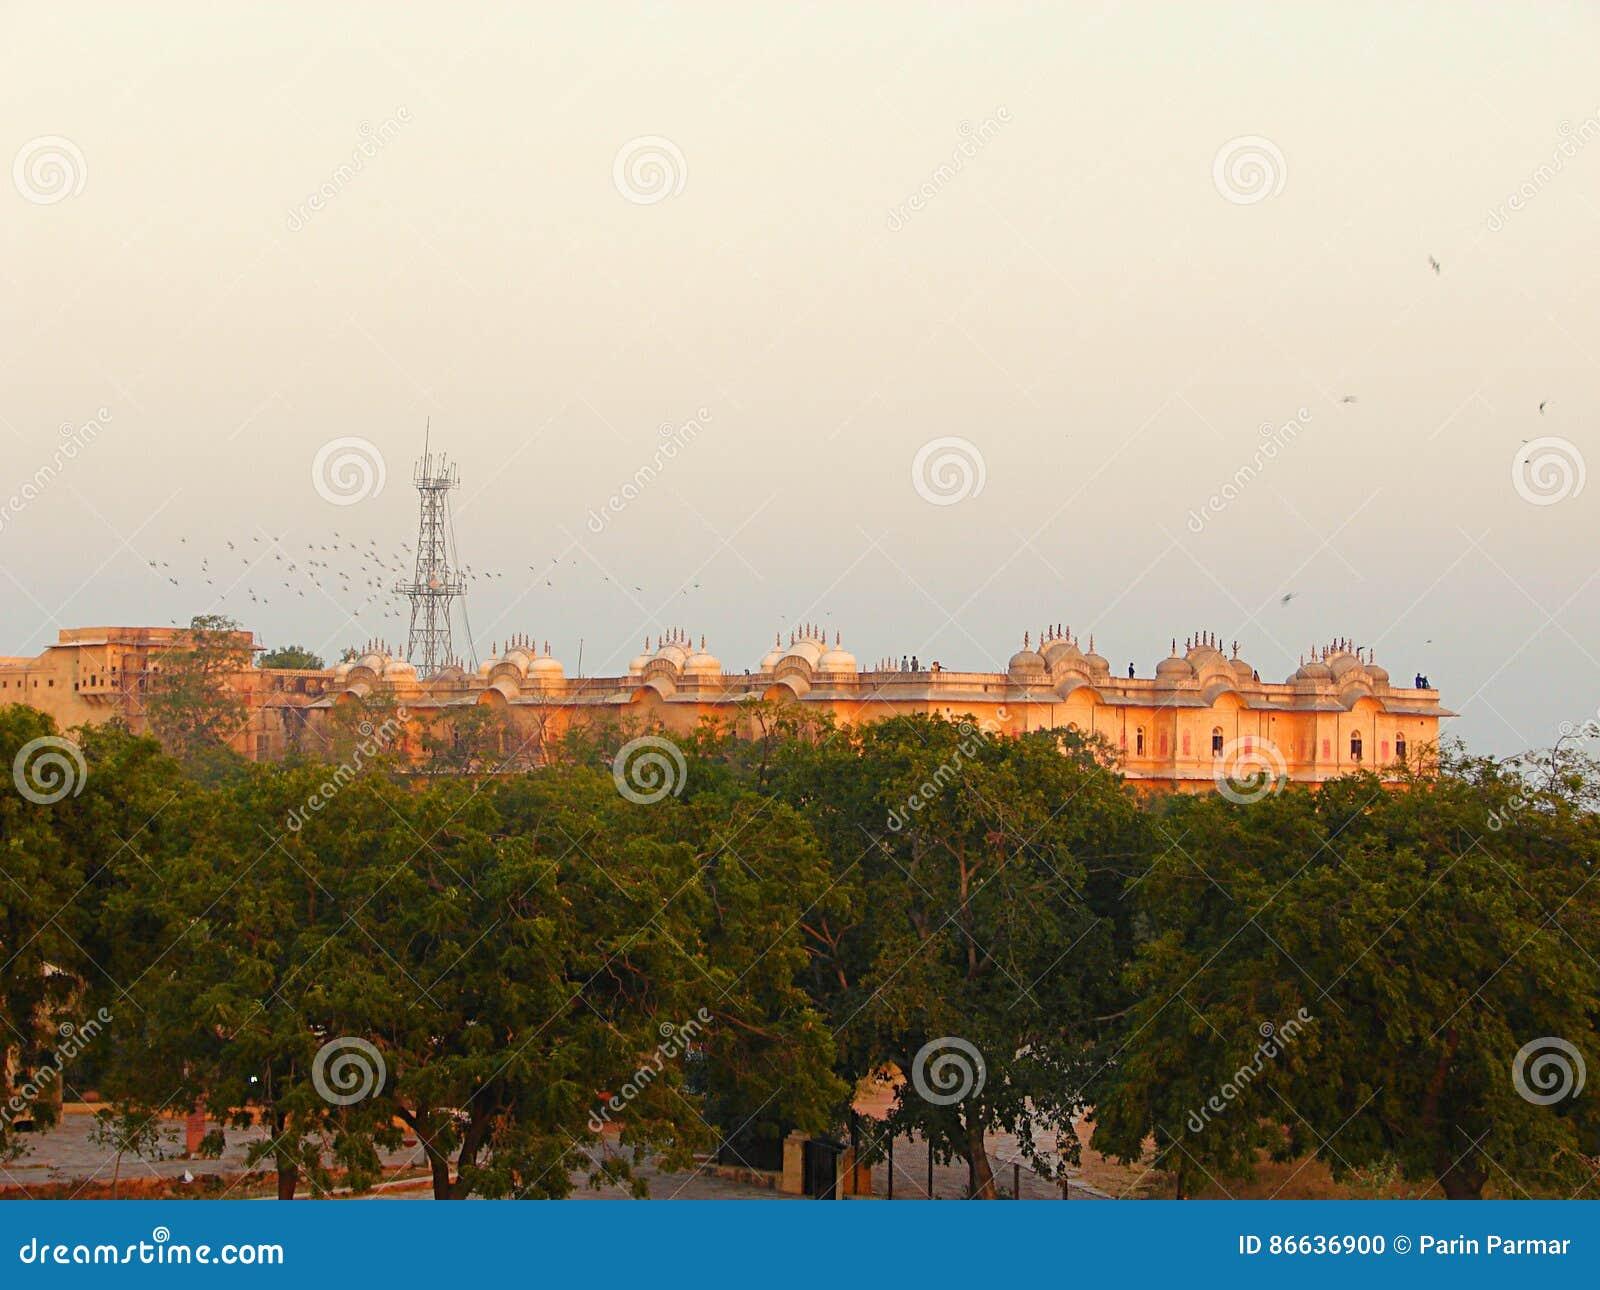 Nahargarhfort of Tiger Fort van Afstand, Jaipur, Rajasthan, India